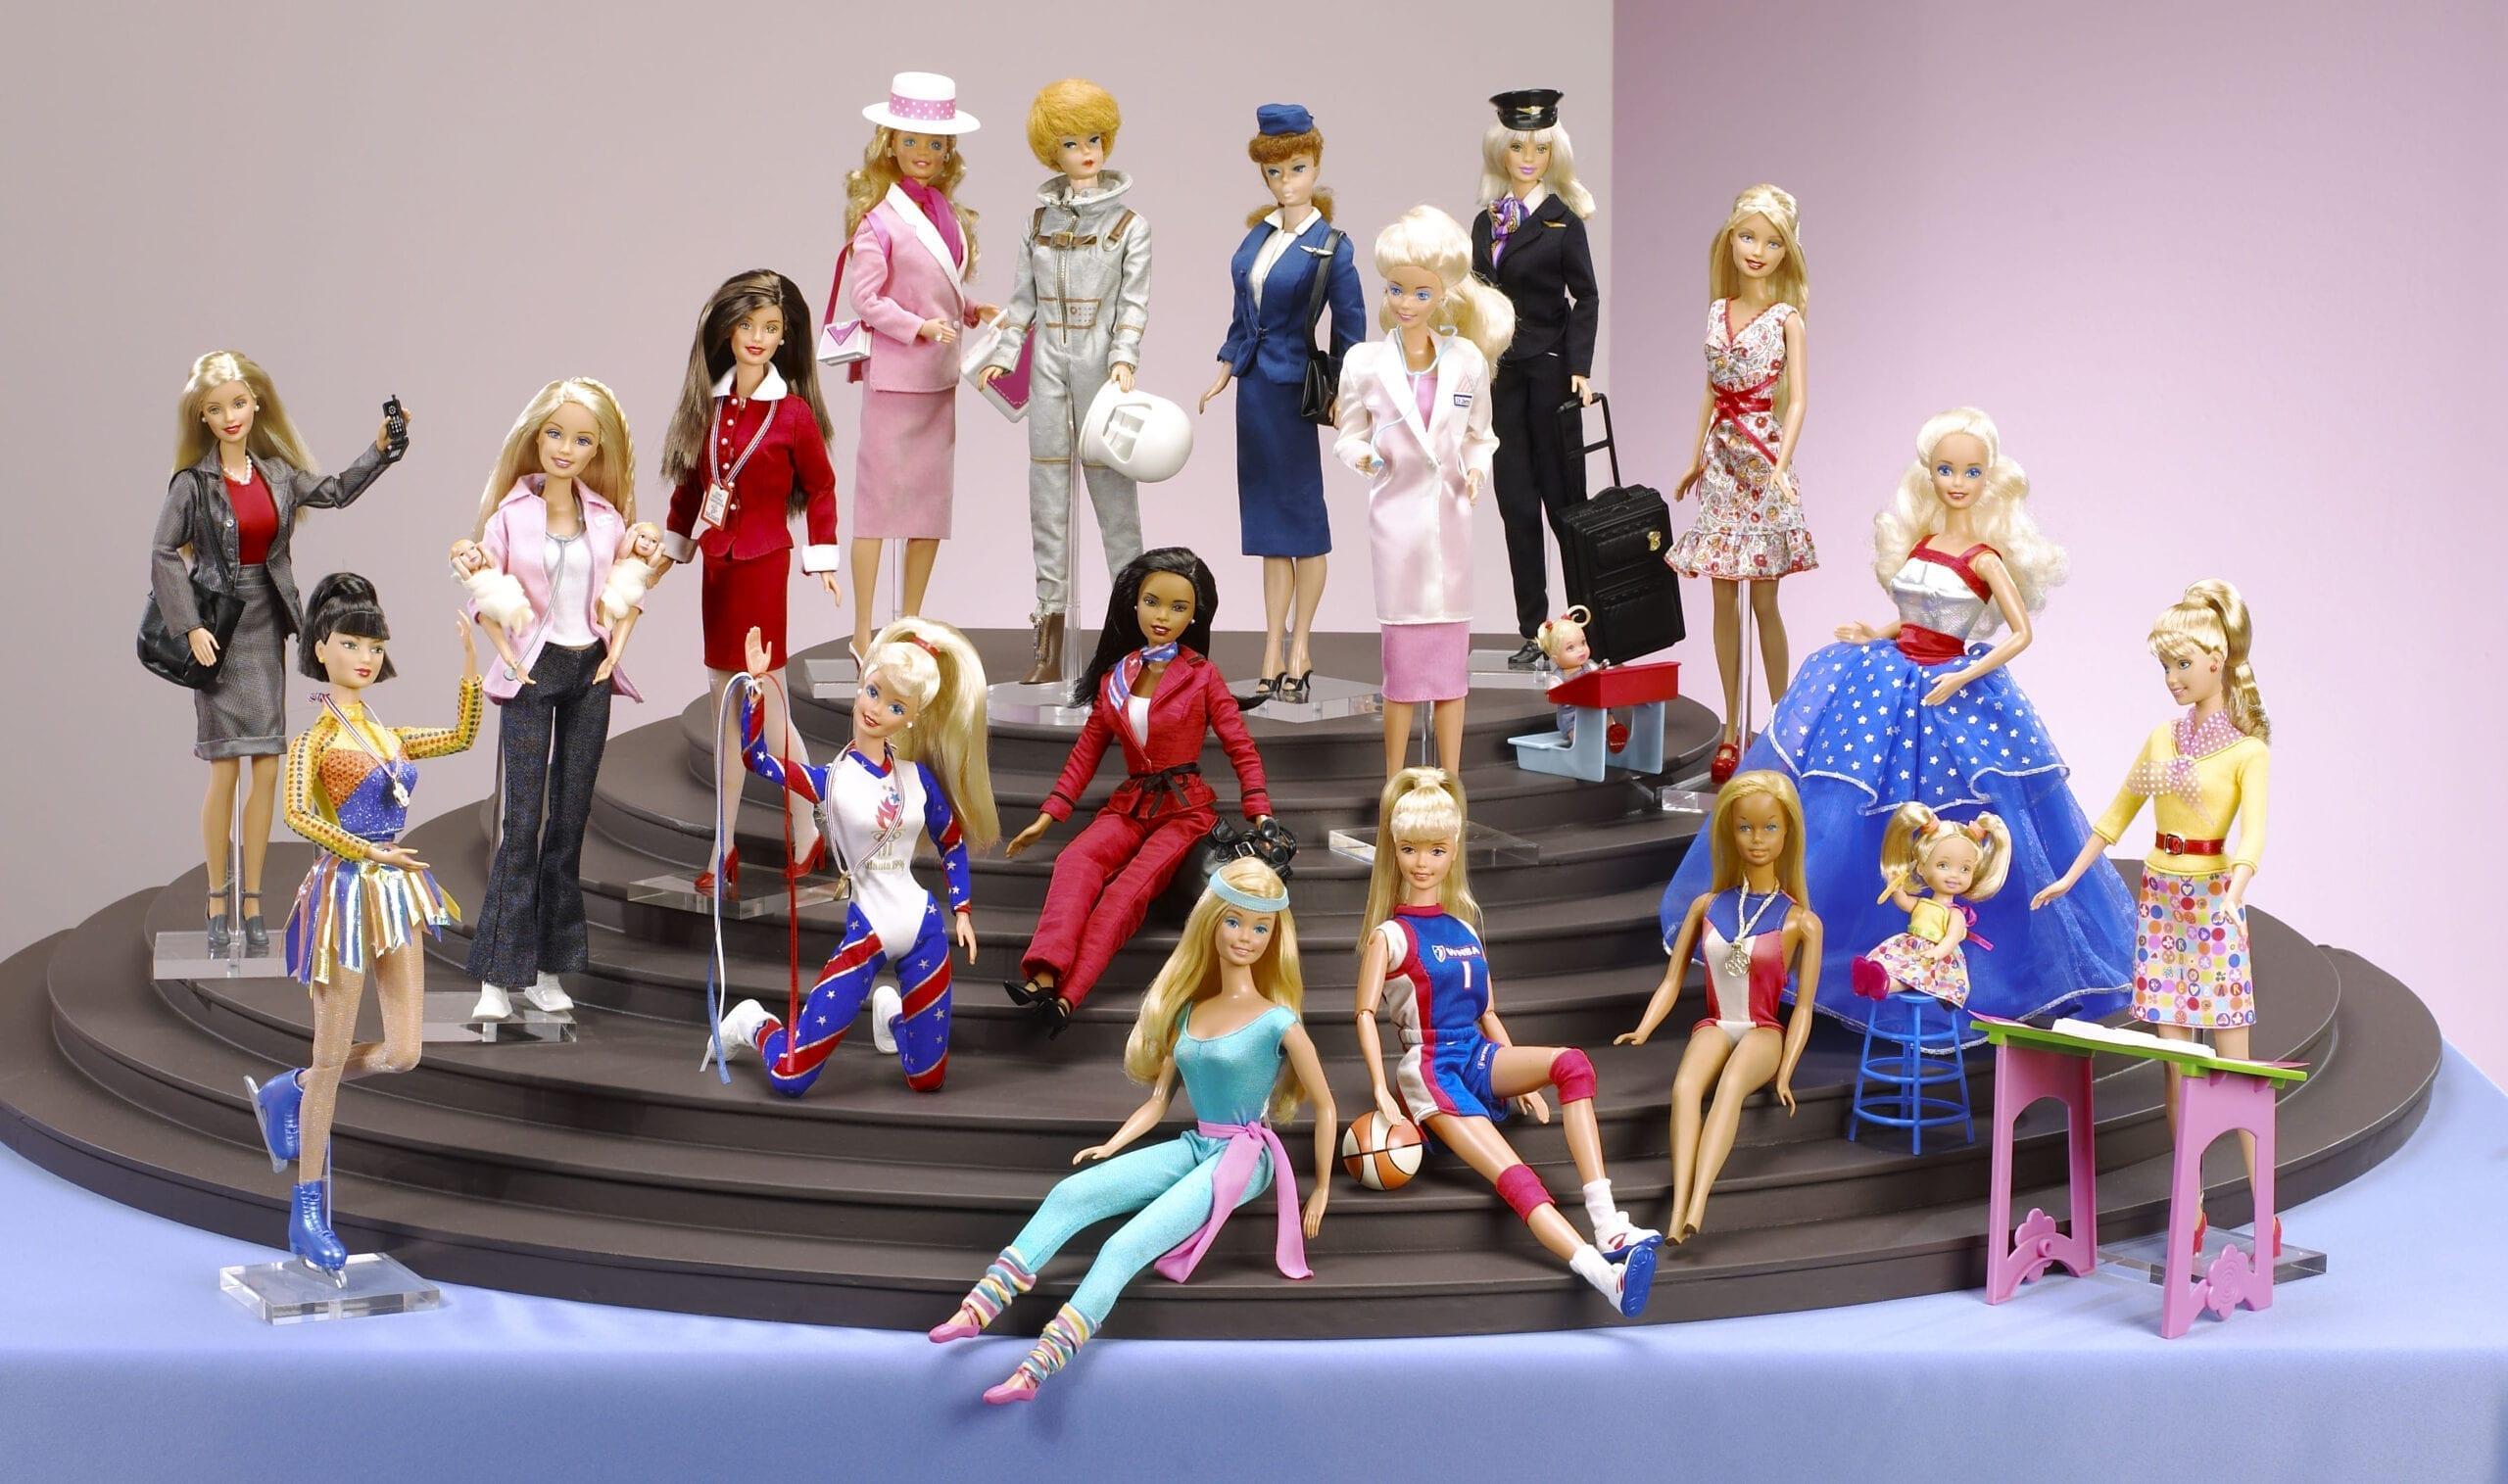 mudec barbie, theladycracy.it, elisa bellino, fashion blog italia, mudec barbie